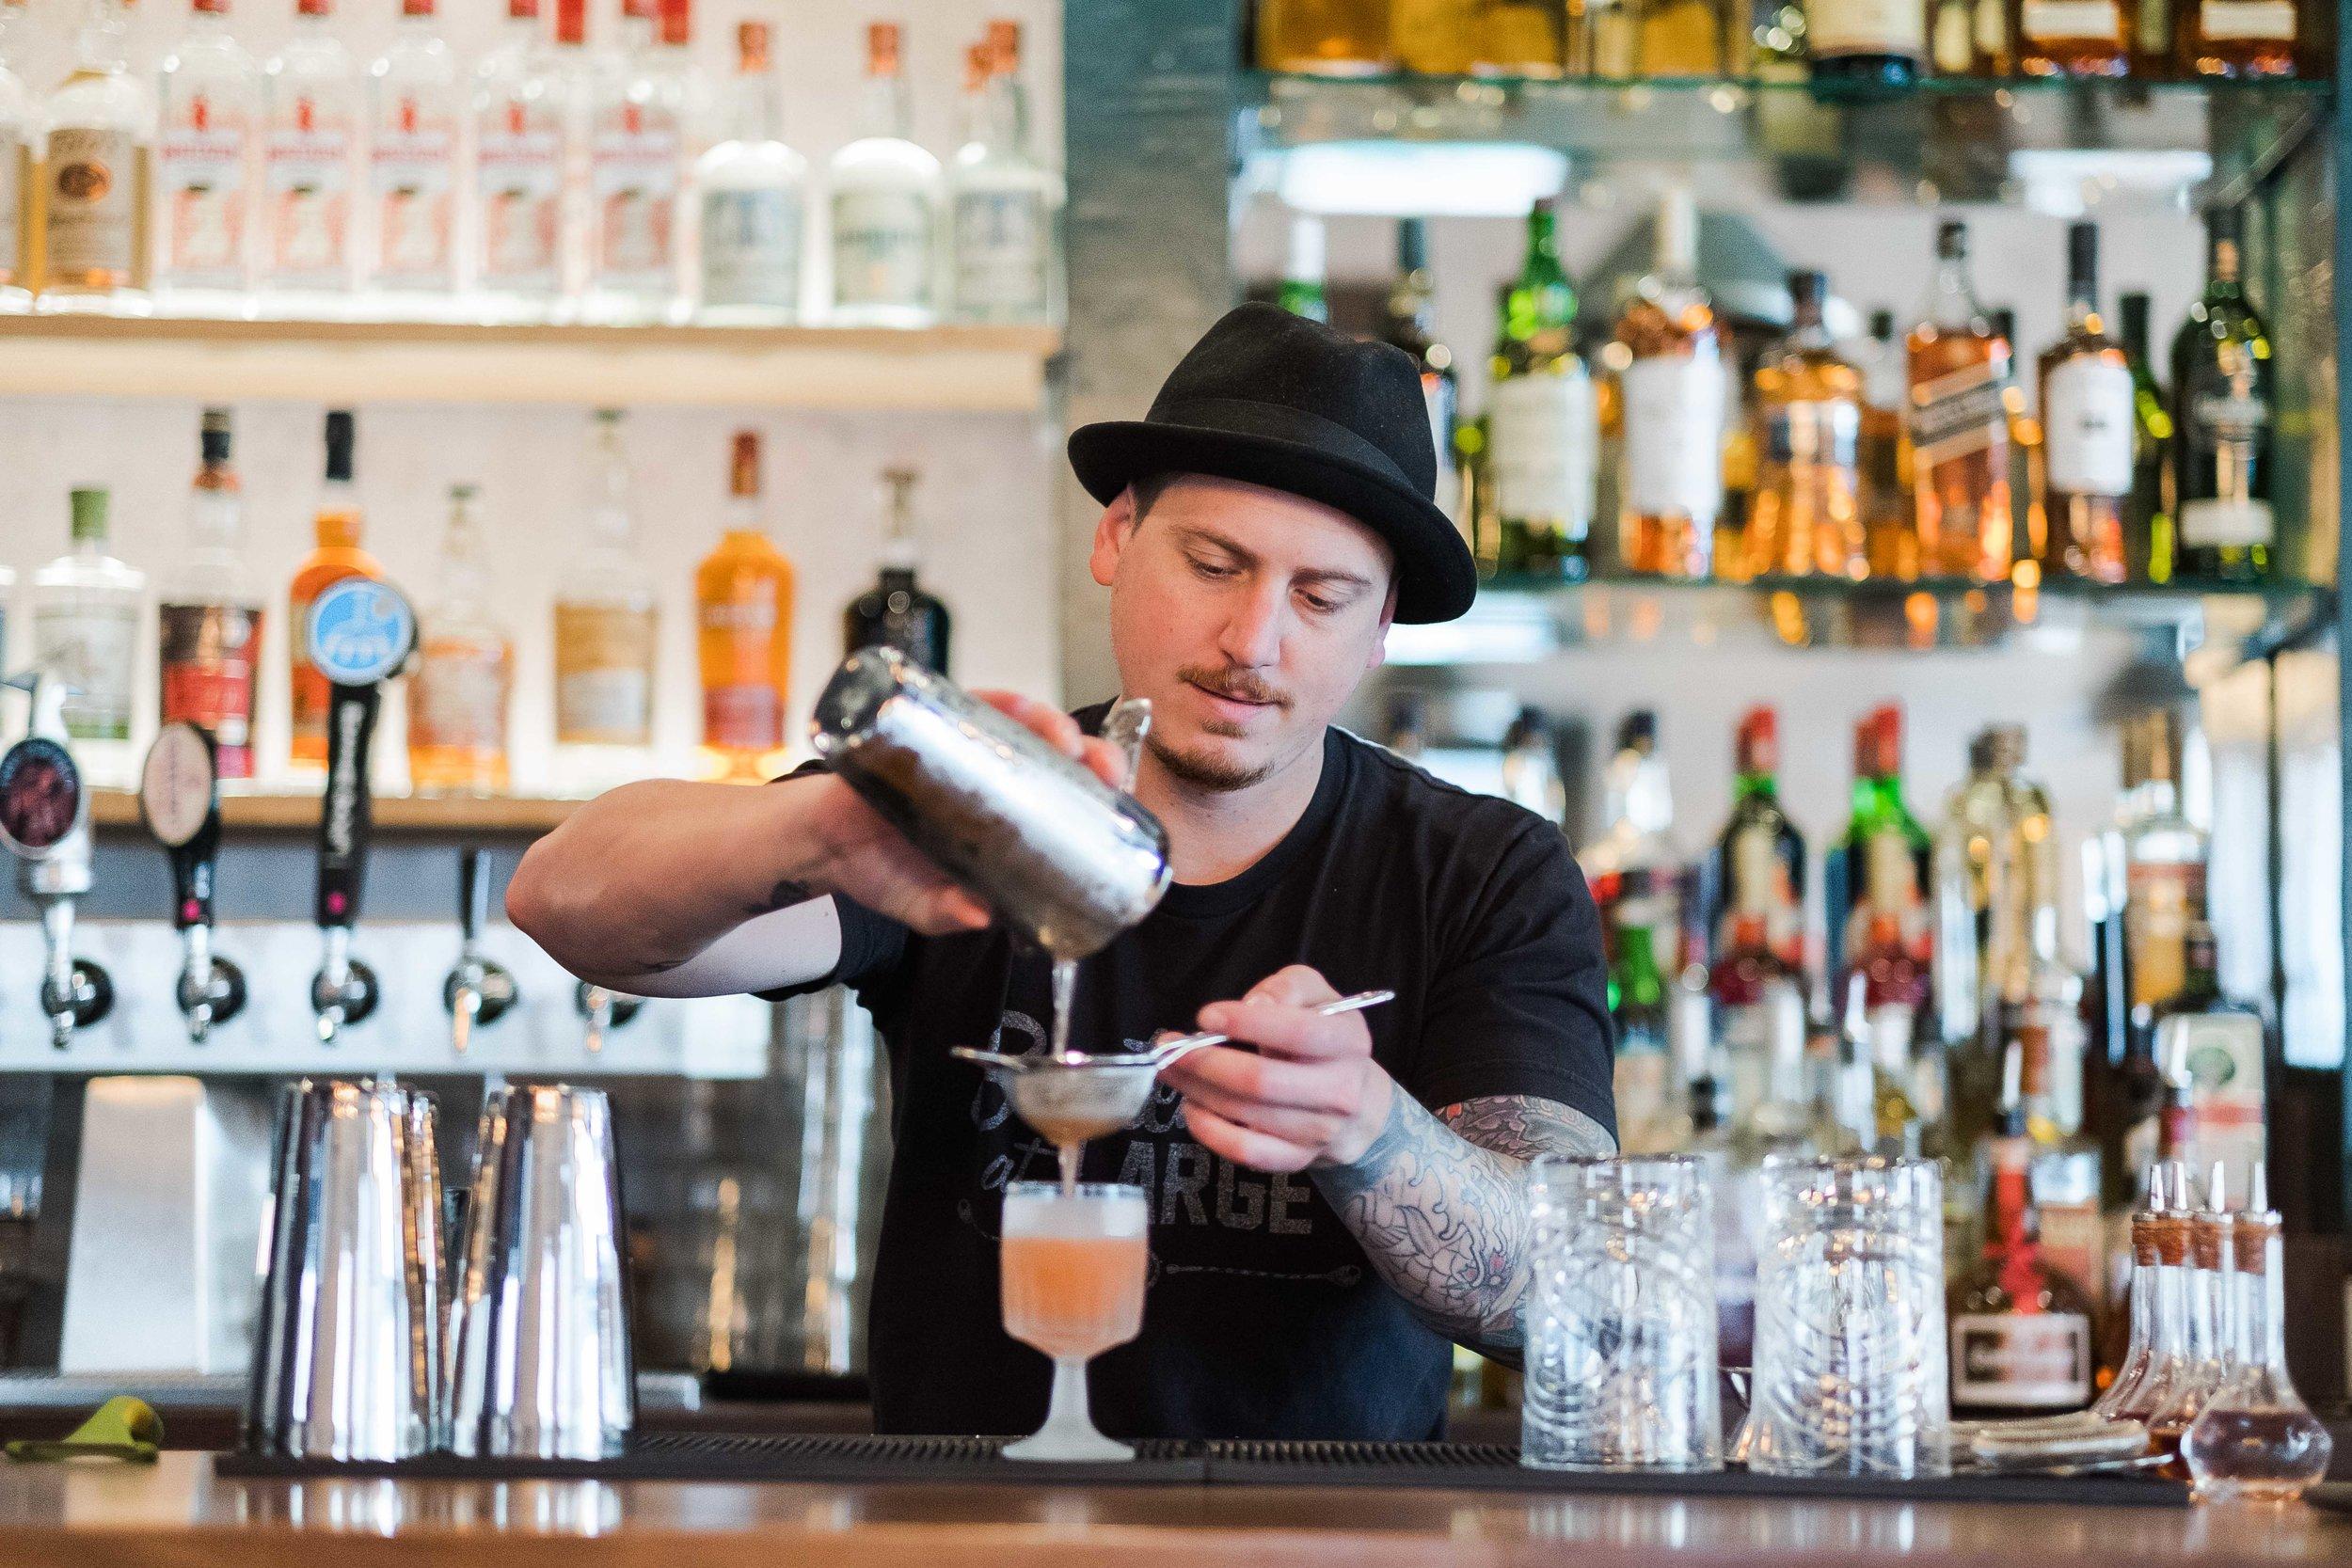 Frank McGrath mixing cocktails at bar